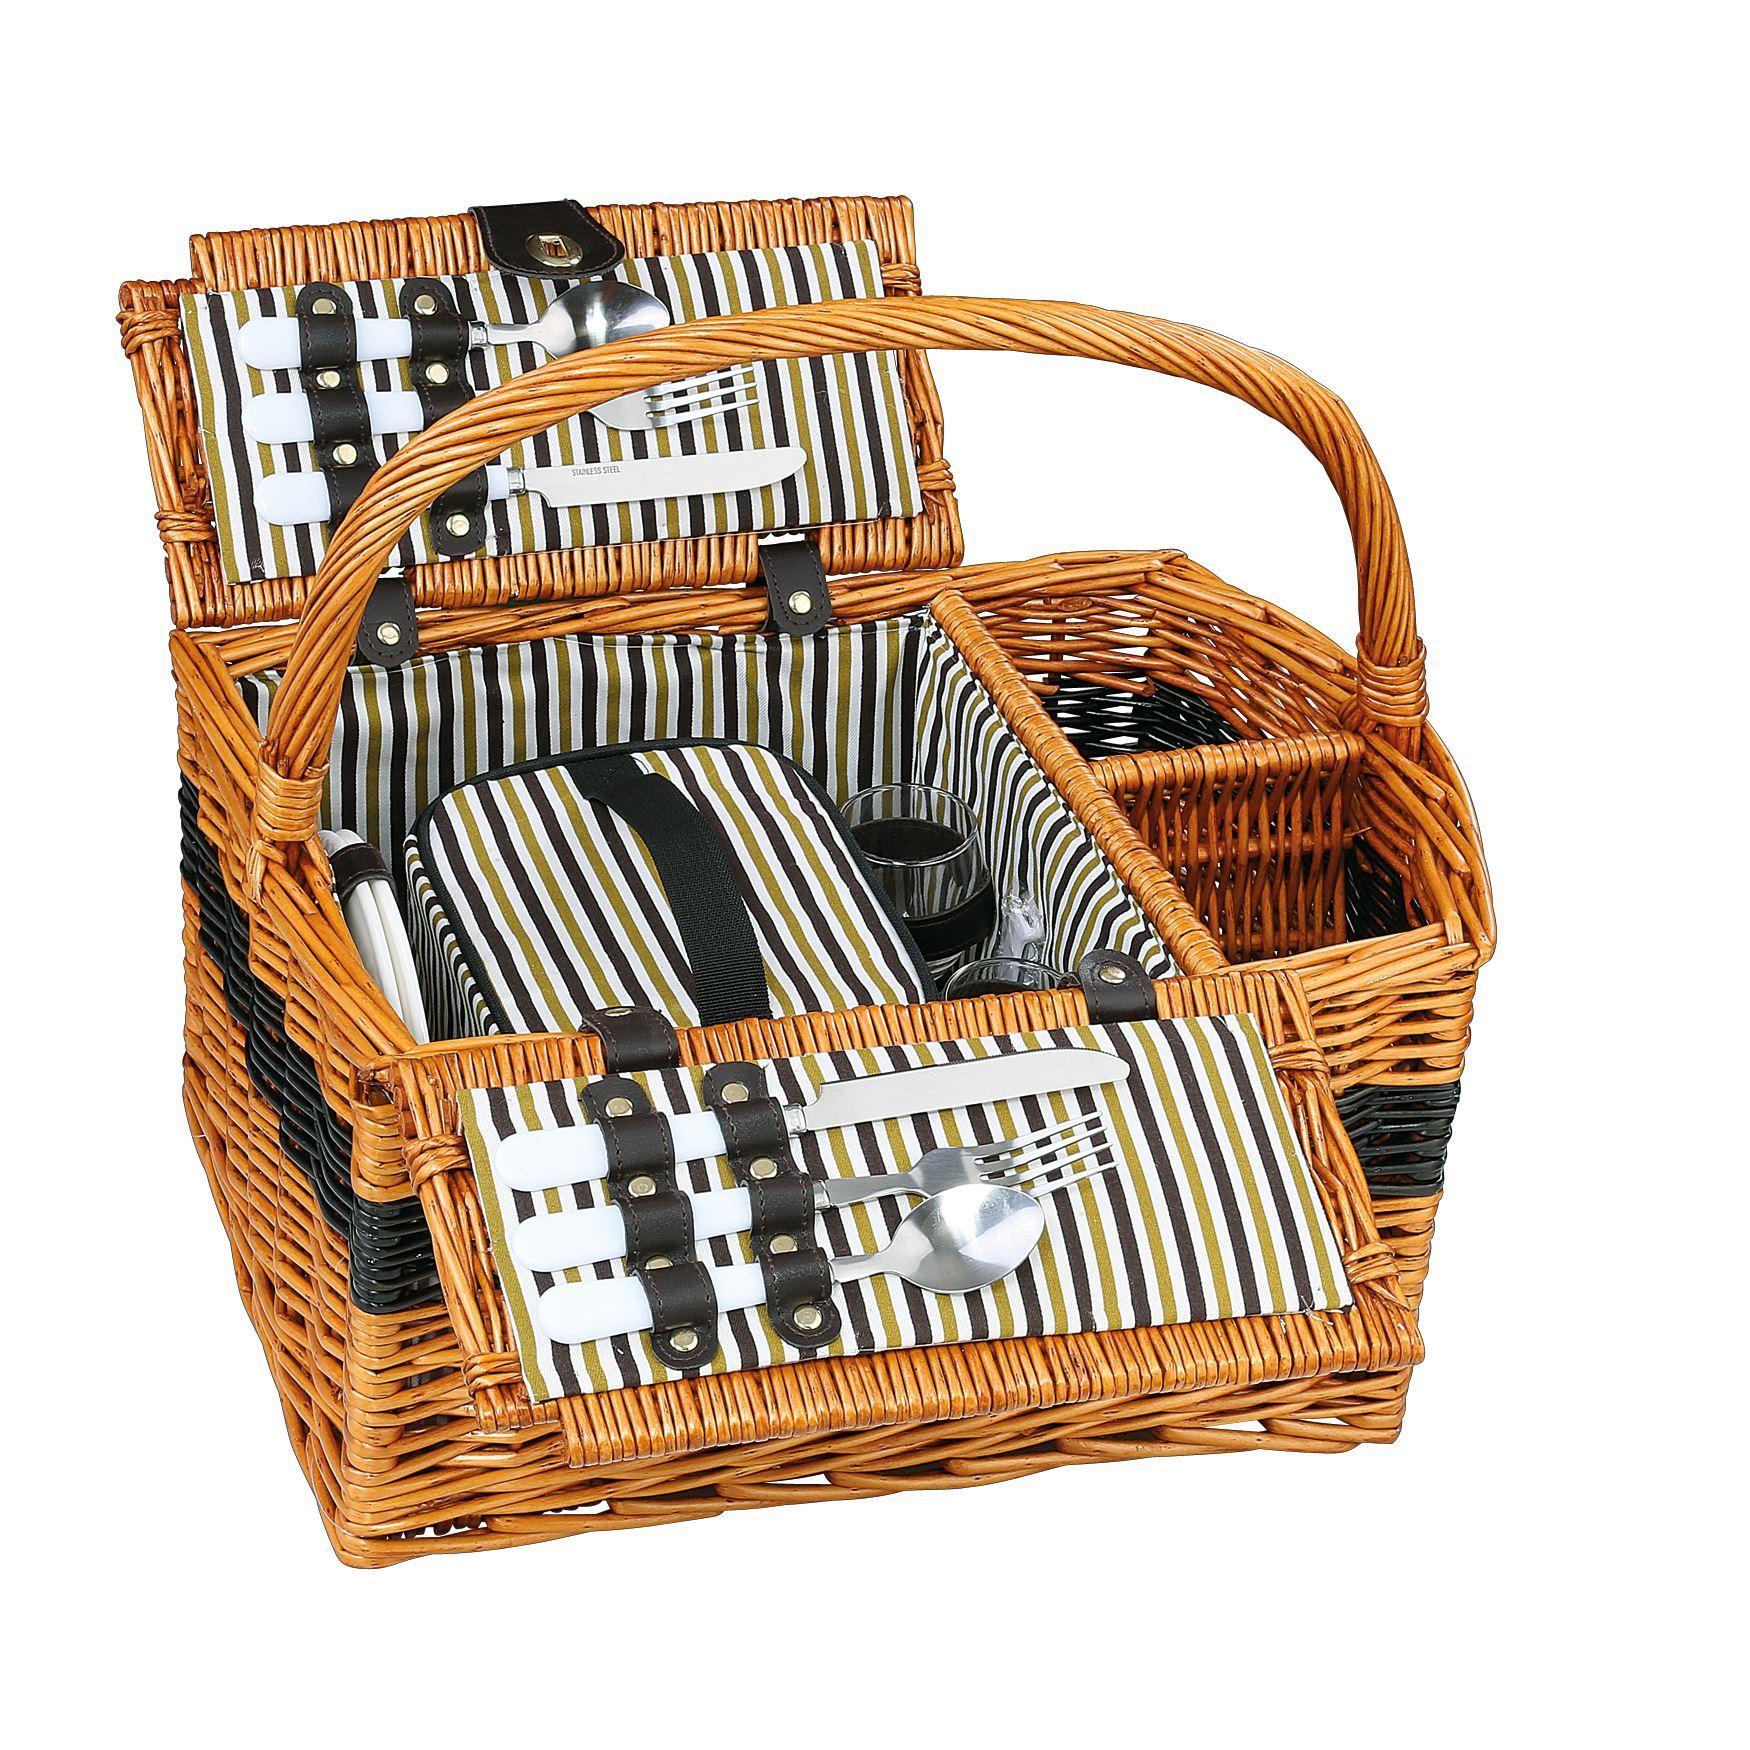 cilio picknick korb cernobbio f r 2 personen hellbraun. Black Bedroom Furniture Sets. Home Design Ideas